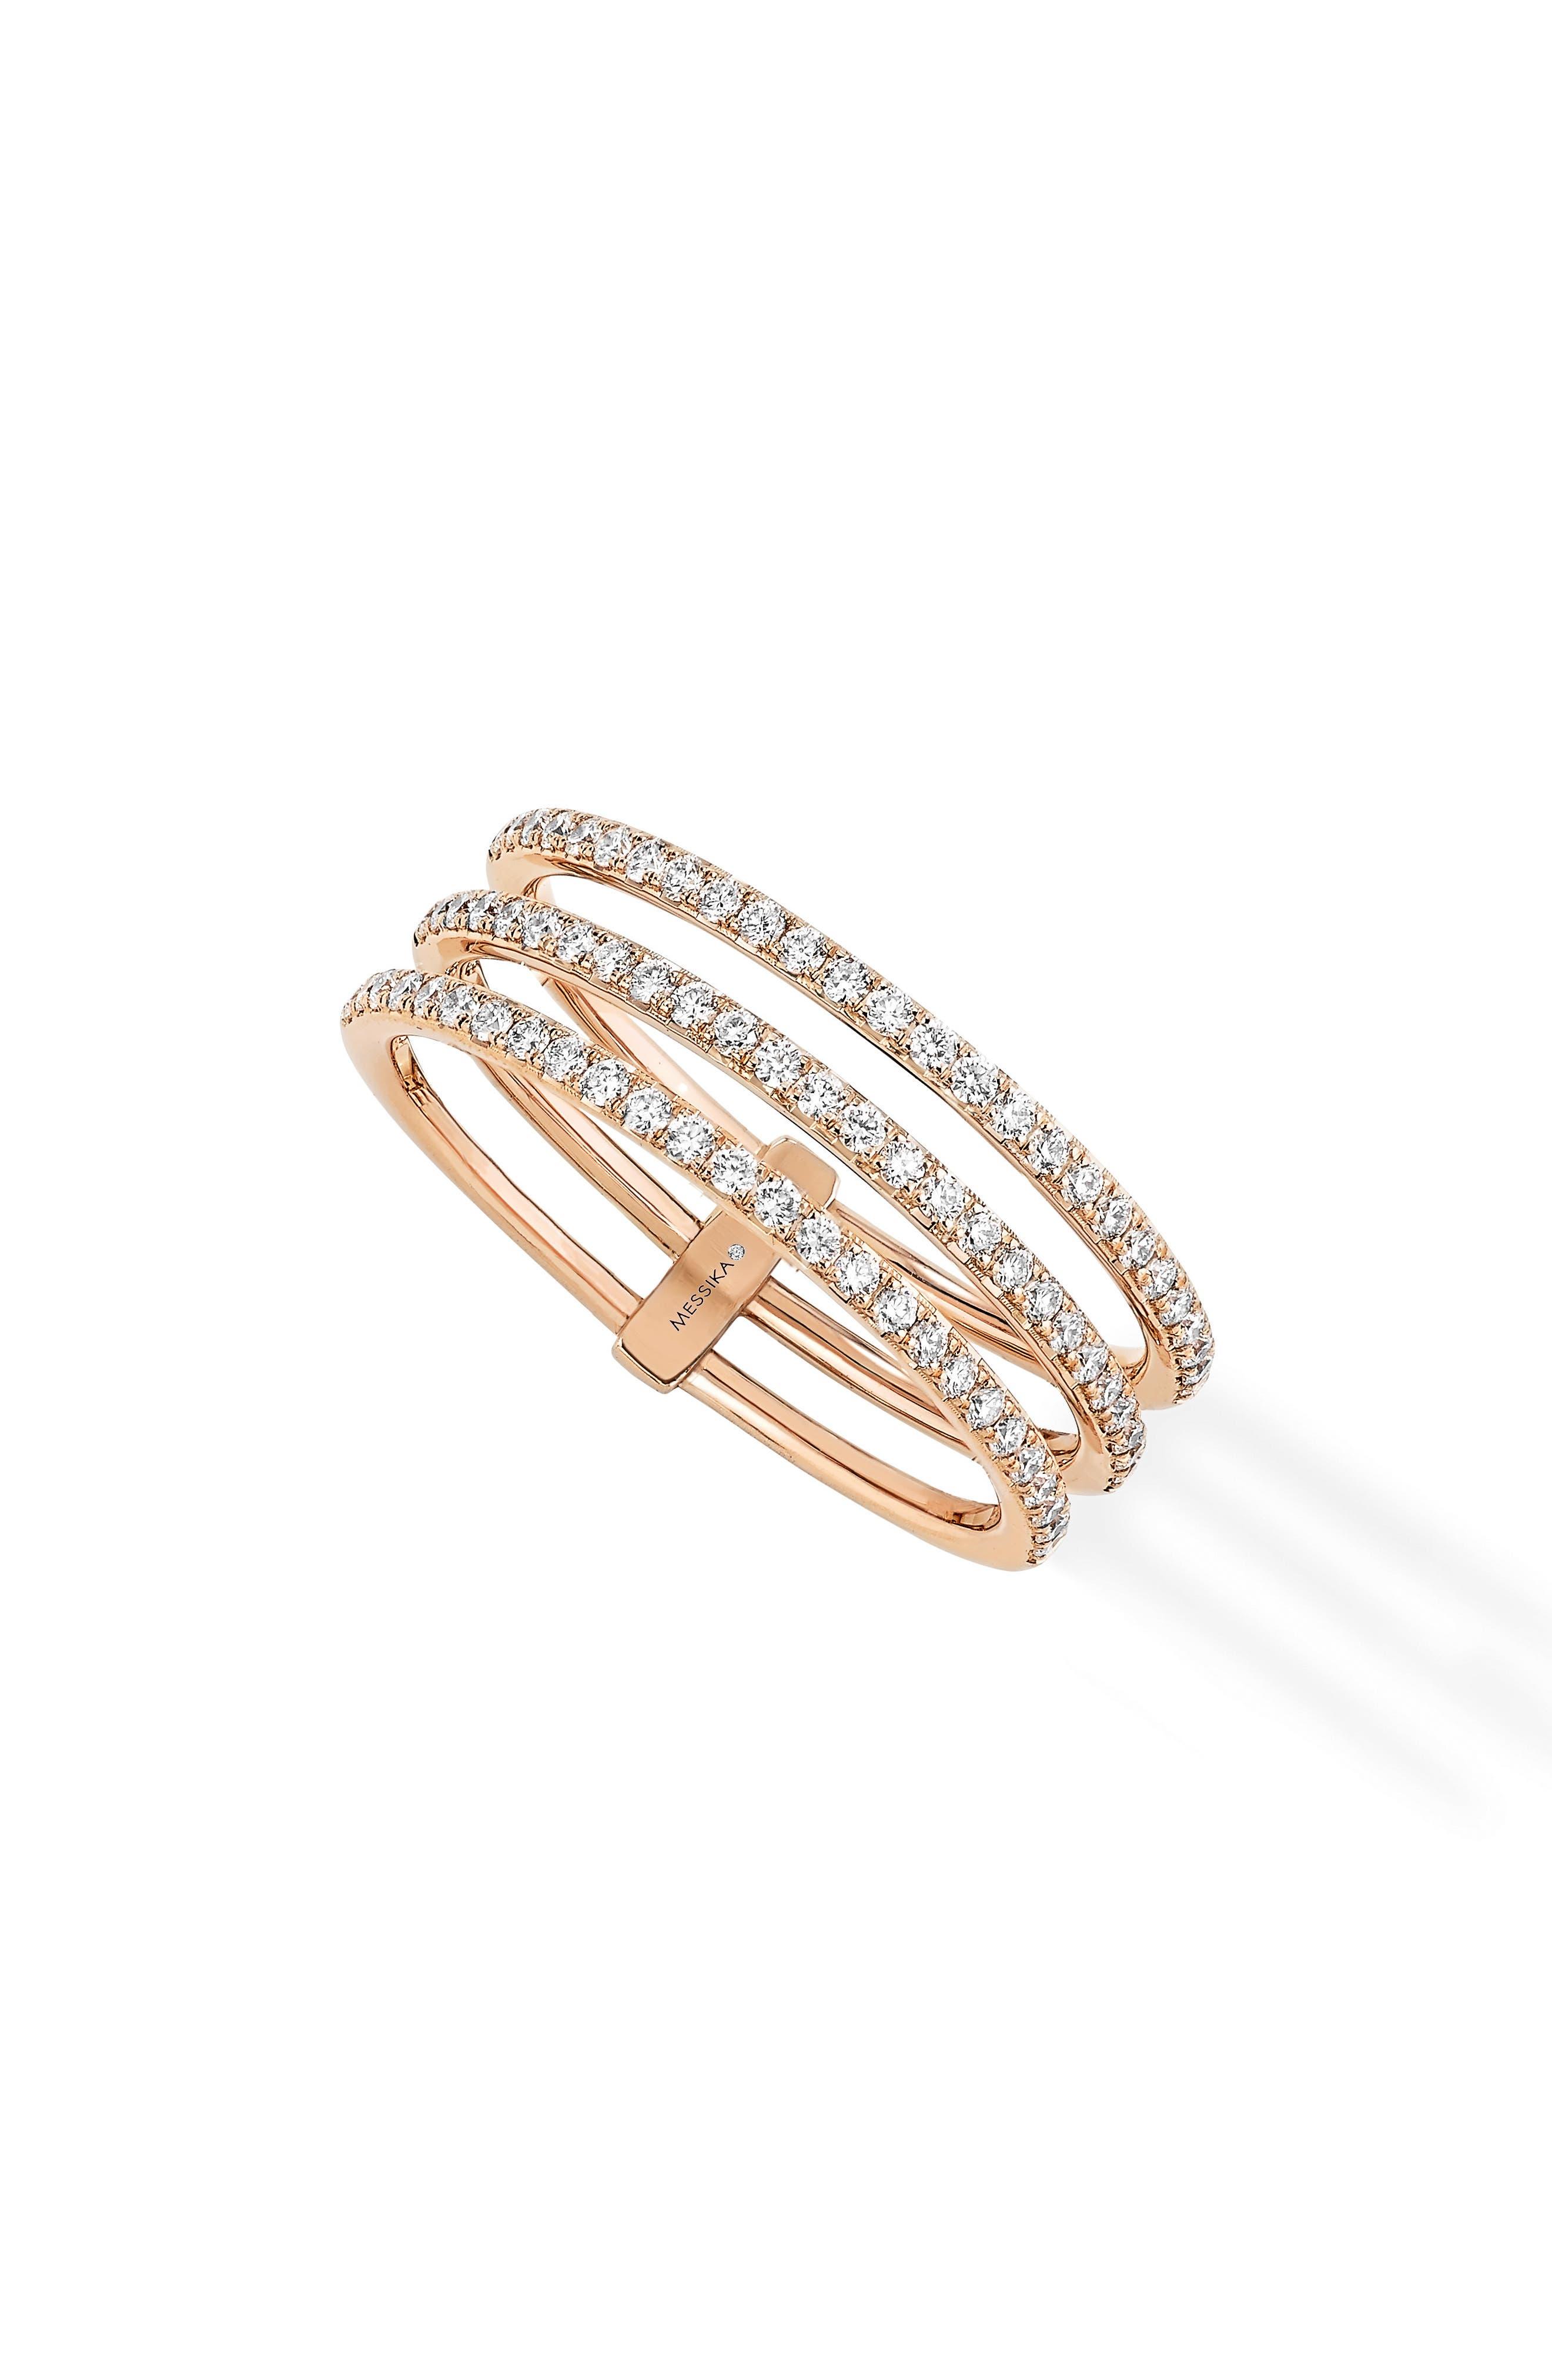 Alternate Image 1 Selected - Messika 3-Row Diamond Ring